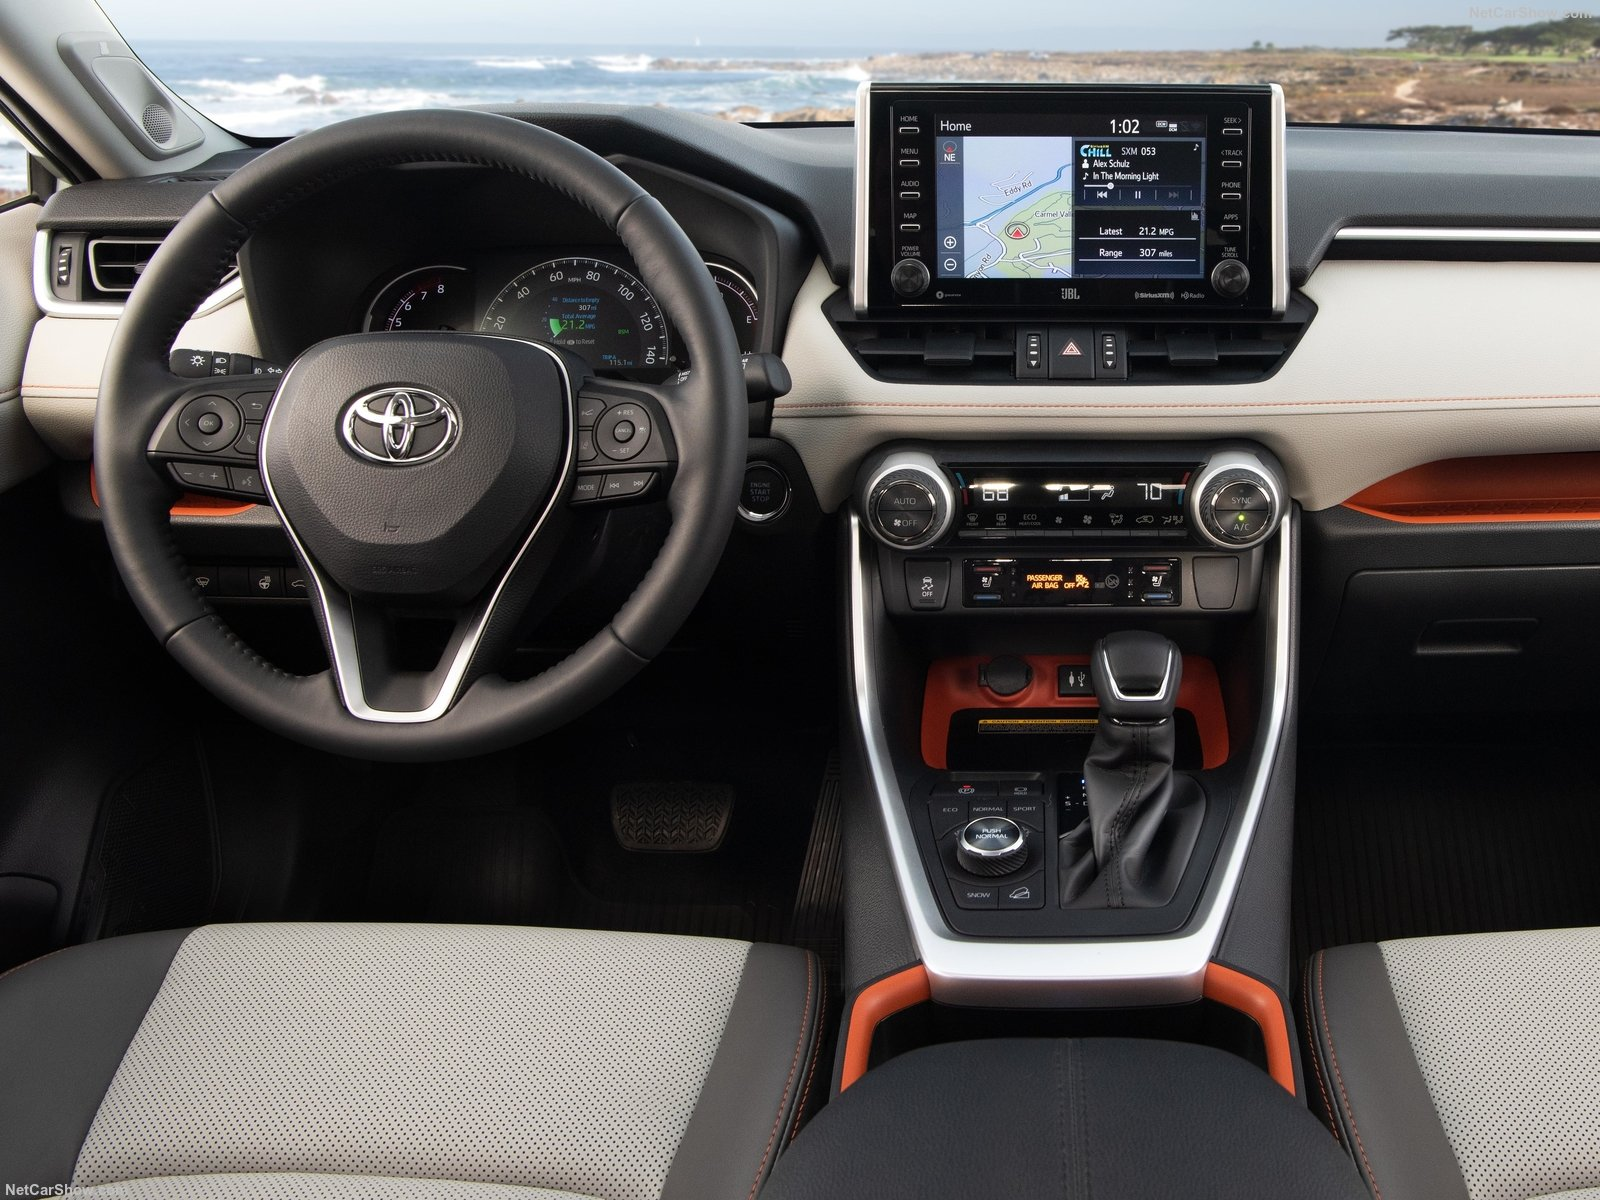 Toyota-RAV4_Adventure-2019-1600-4c_20190406191206d20.jpg